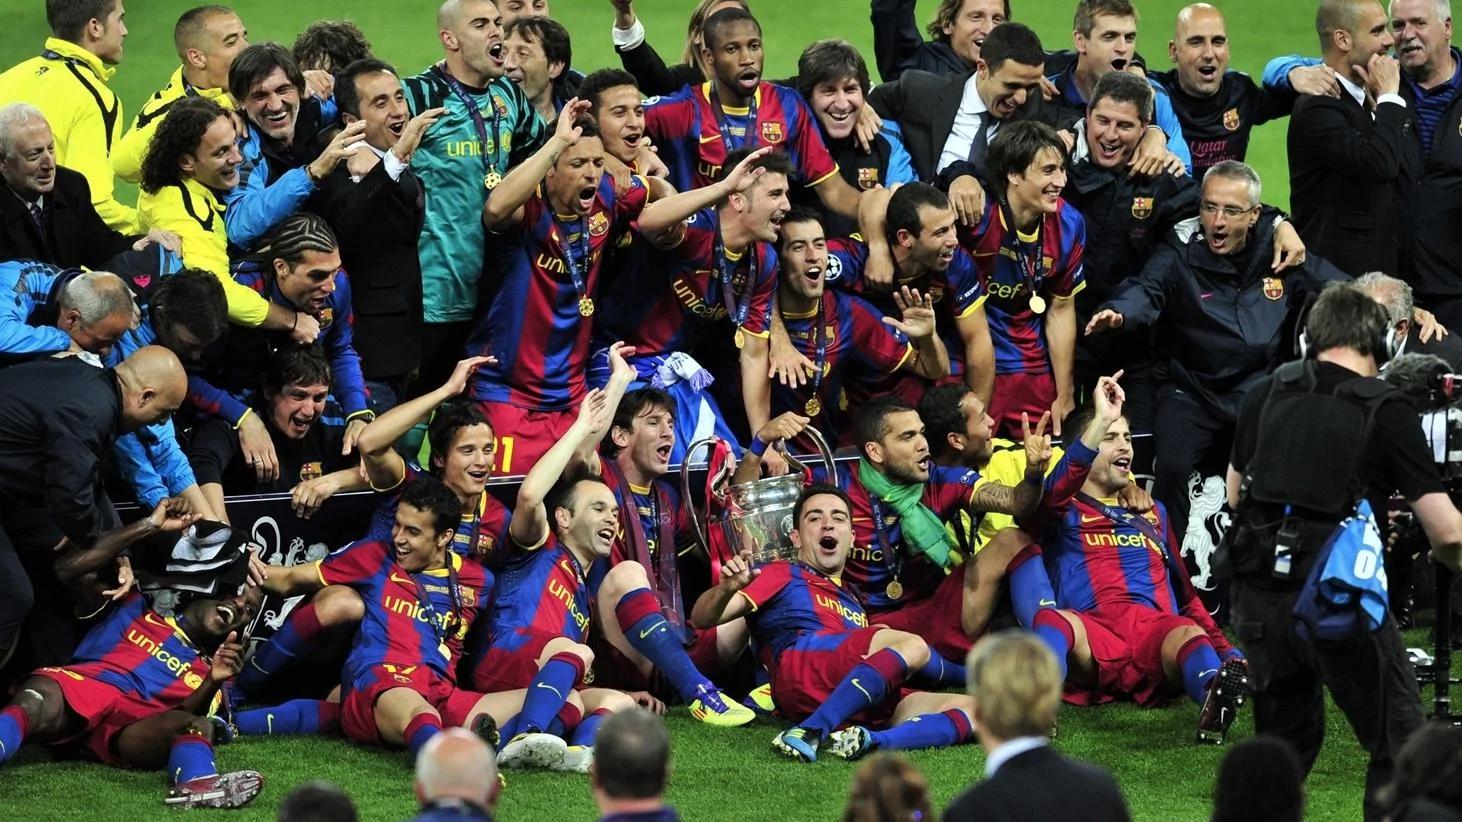 بارسلونا / لیگ قهرمانان اروپا / اینفوگرافیک / اروپا